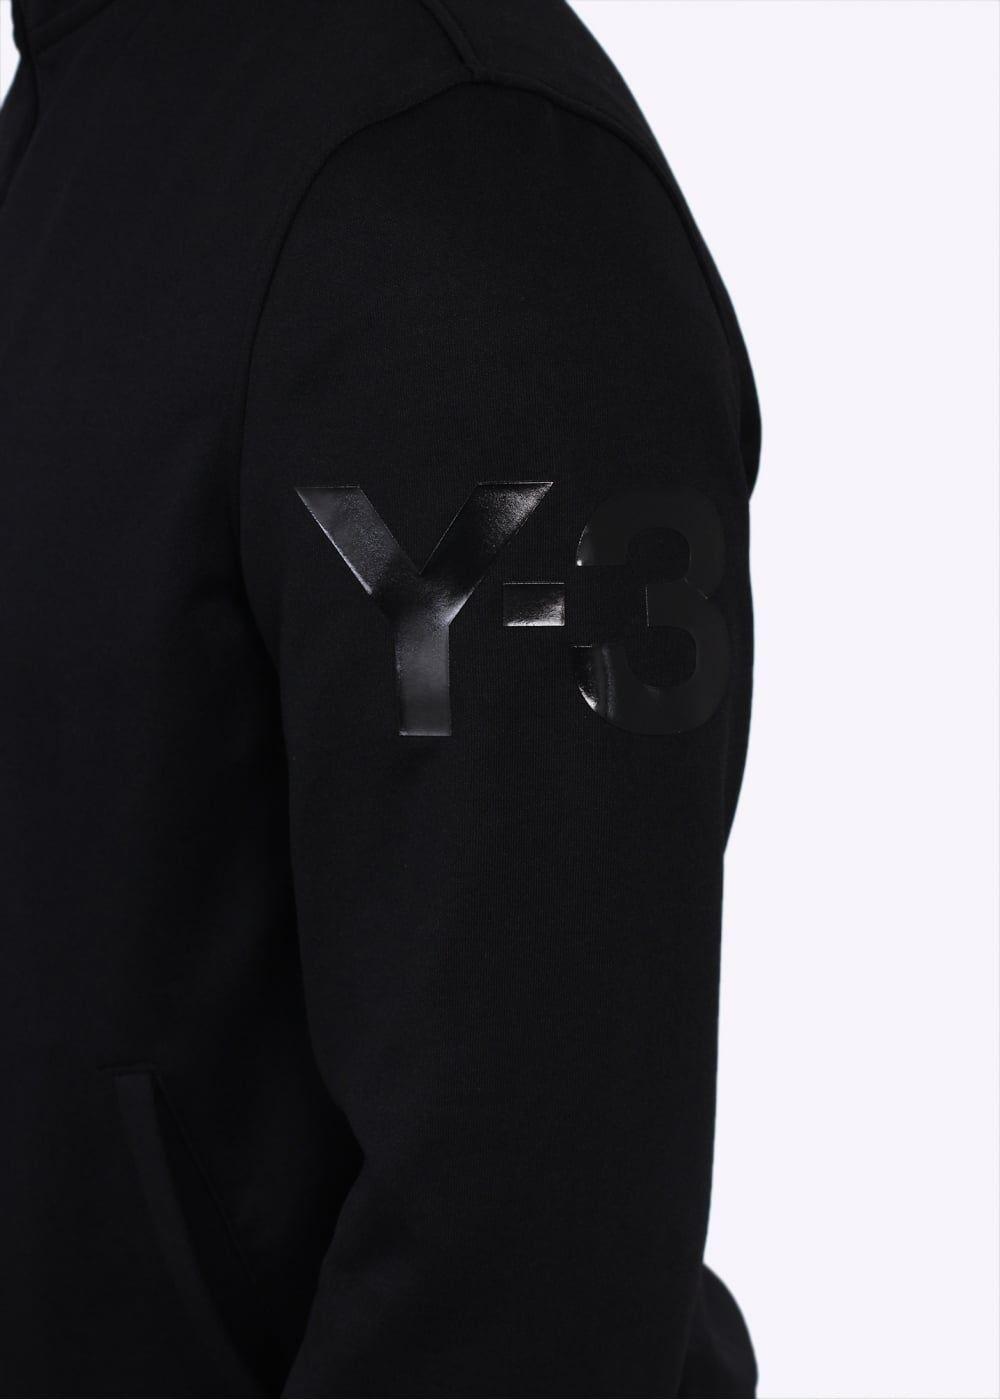 Y3 / Adidas Yohji Yamamoto Classic Track Top Schwarz  